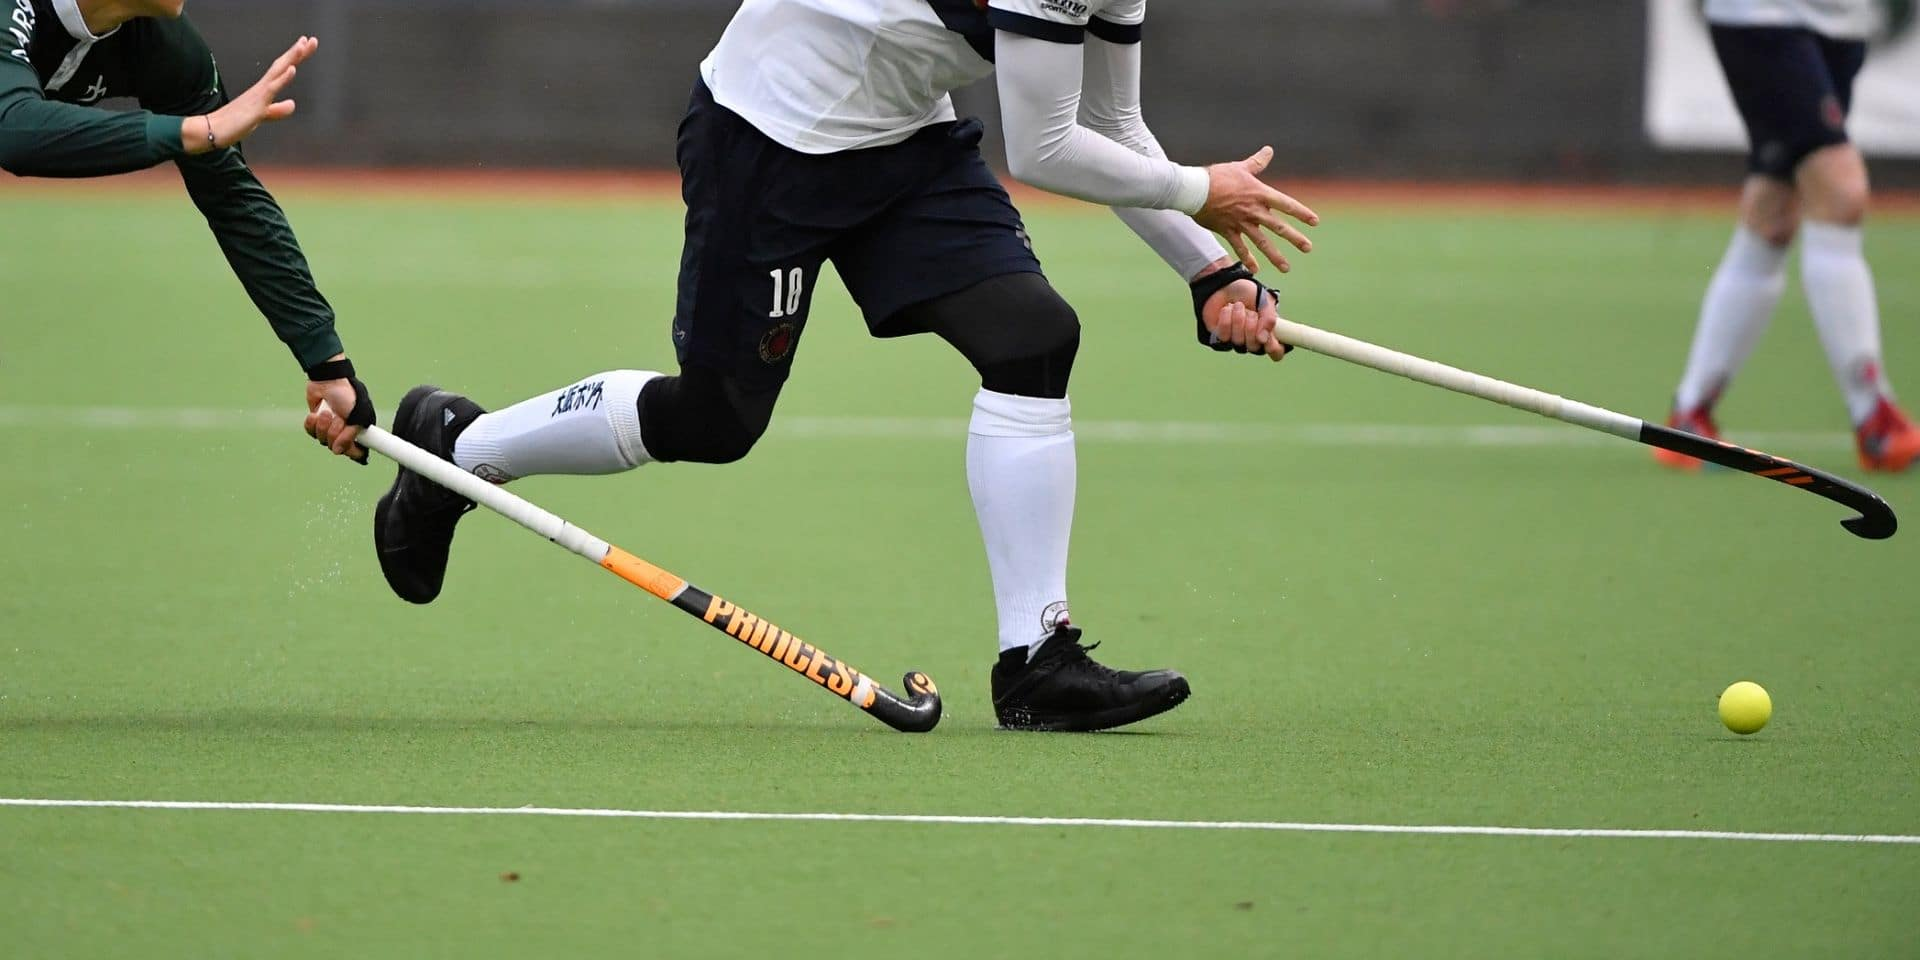 Hockey D1 : l'Old Club réussit sa mission à Nivelles